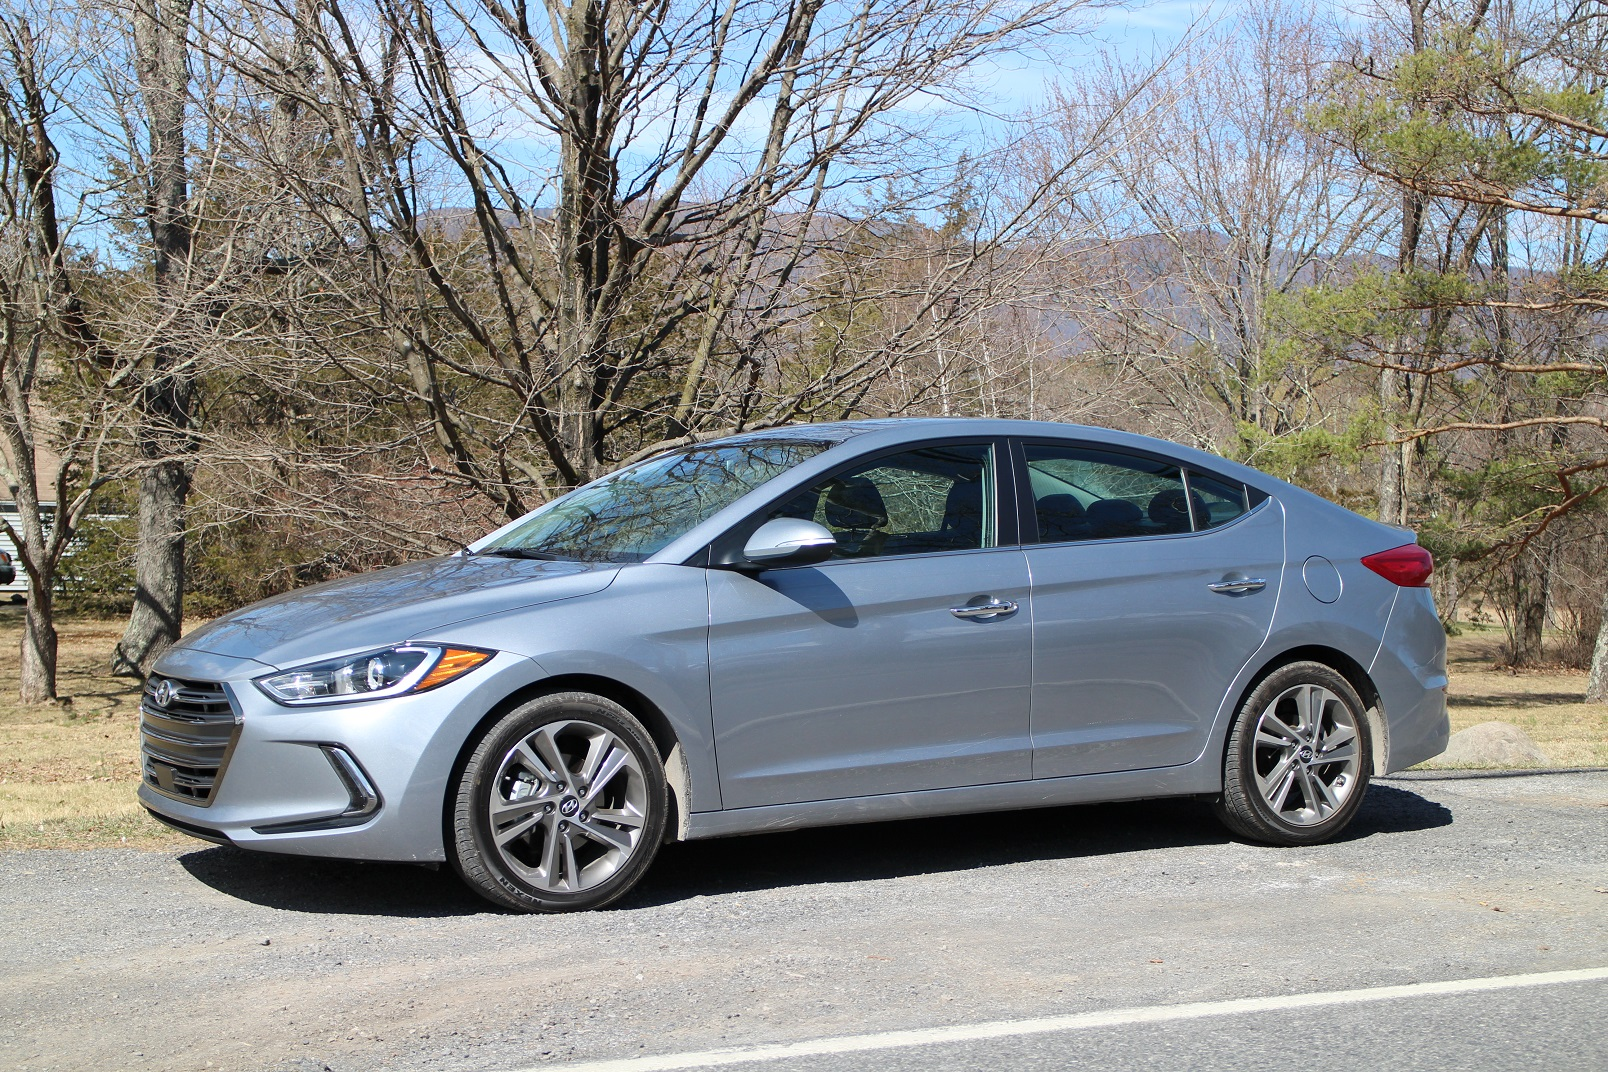 2017 Hyundai Elantra Limited Gas Mileage Review